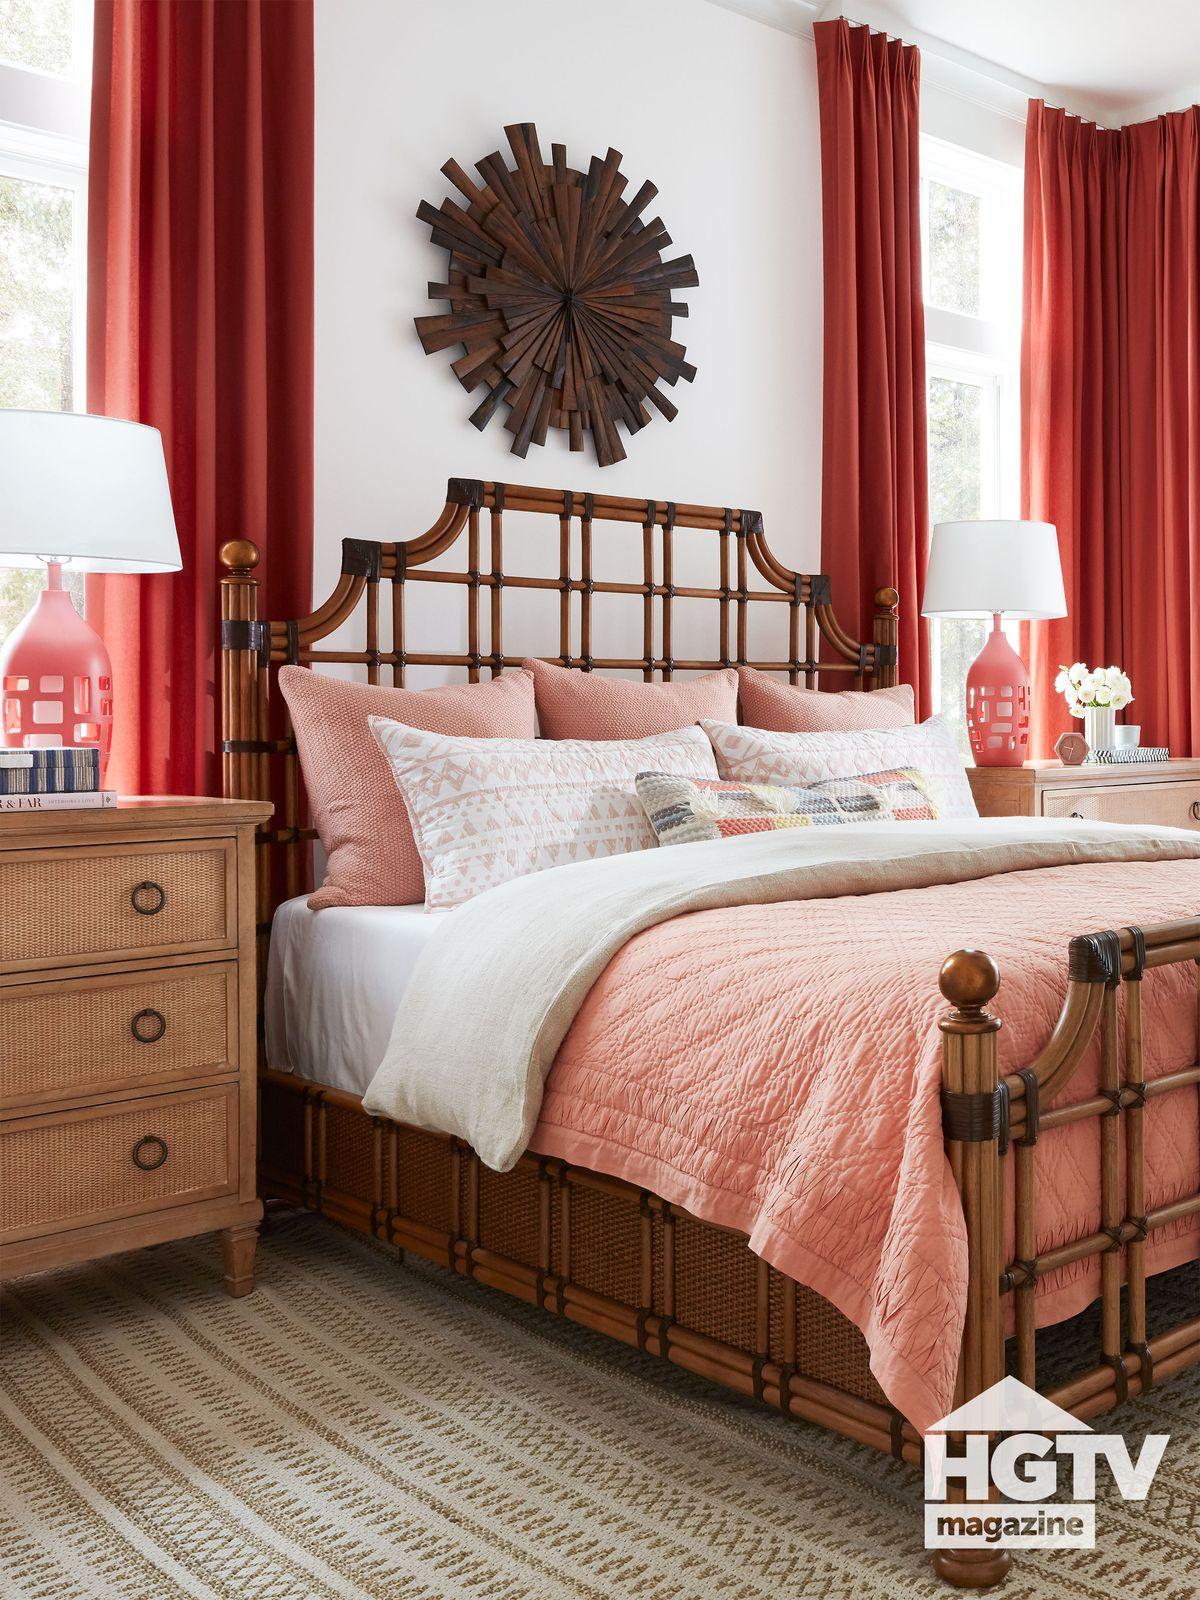 HGTV Dream Home 2020 master bedroom featured in HGTV Magazine